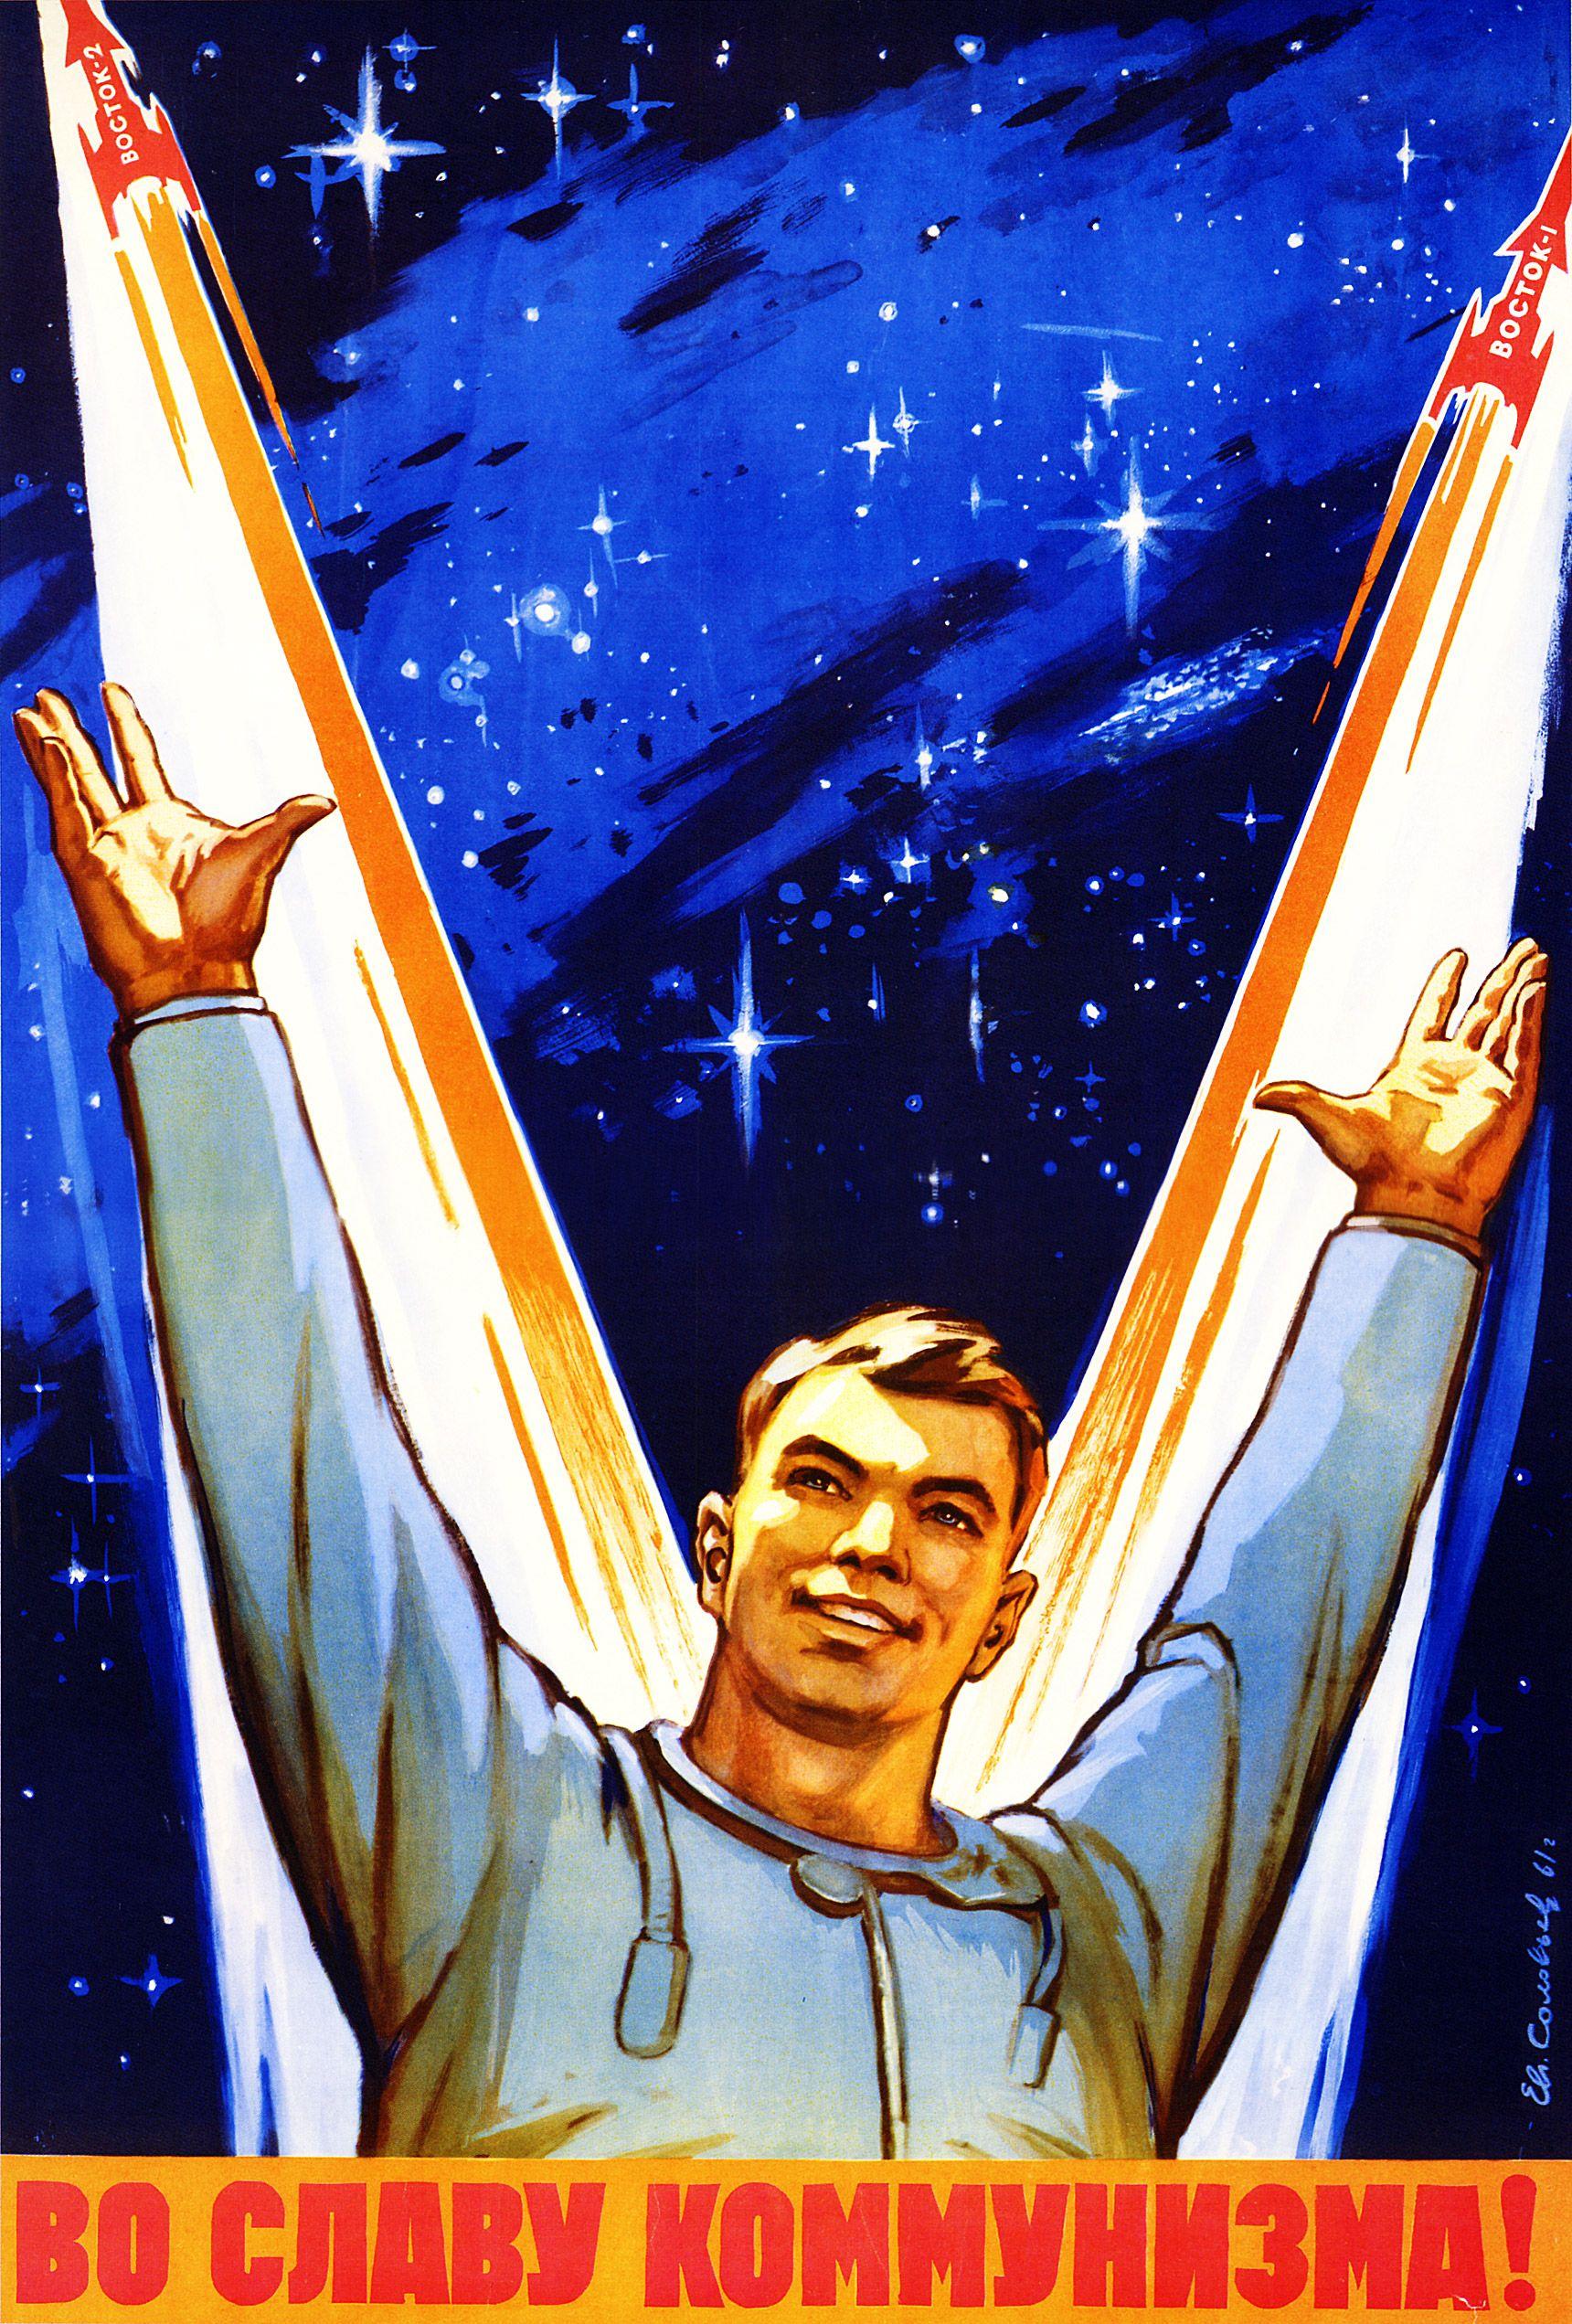 russian space program - photo #28